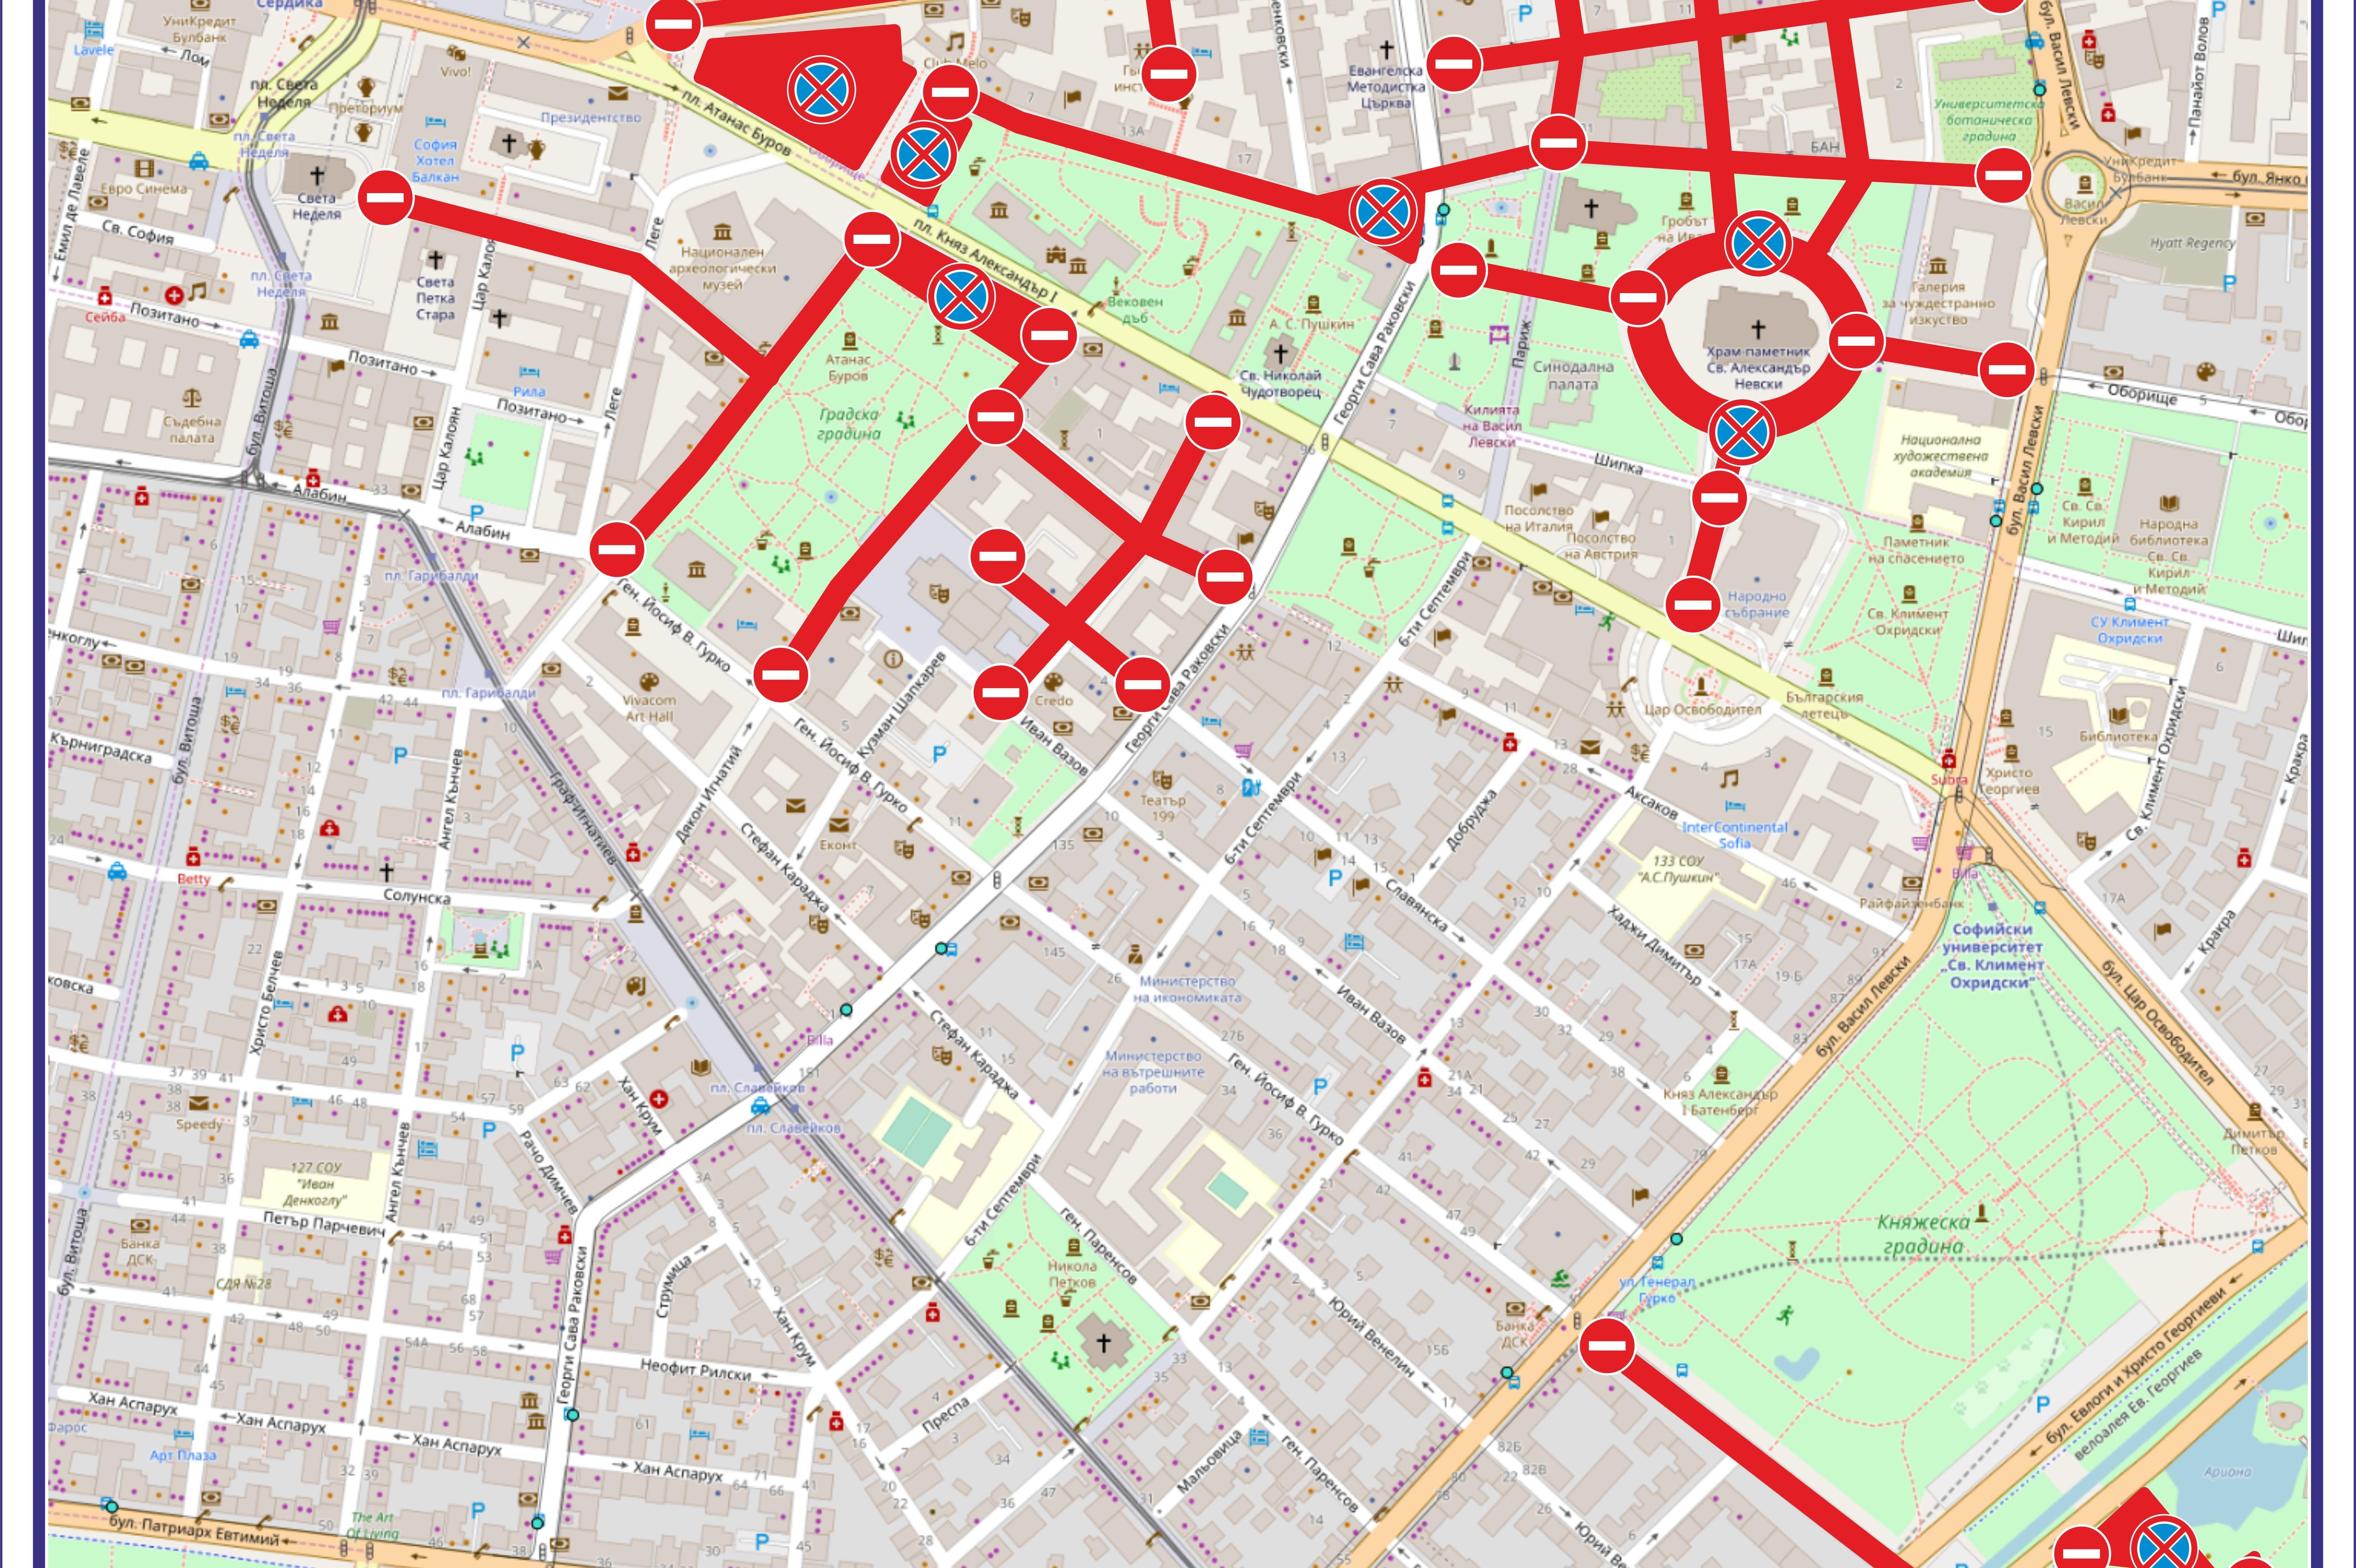 Centrt Na Sofiya Totalno Blokiran Ot 1 Do 7 Maj Stolica Bg